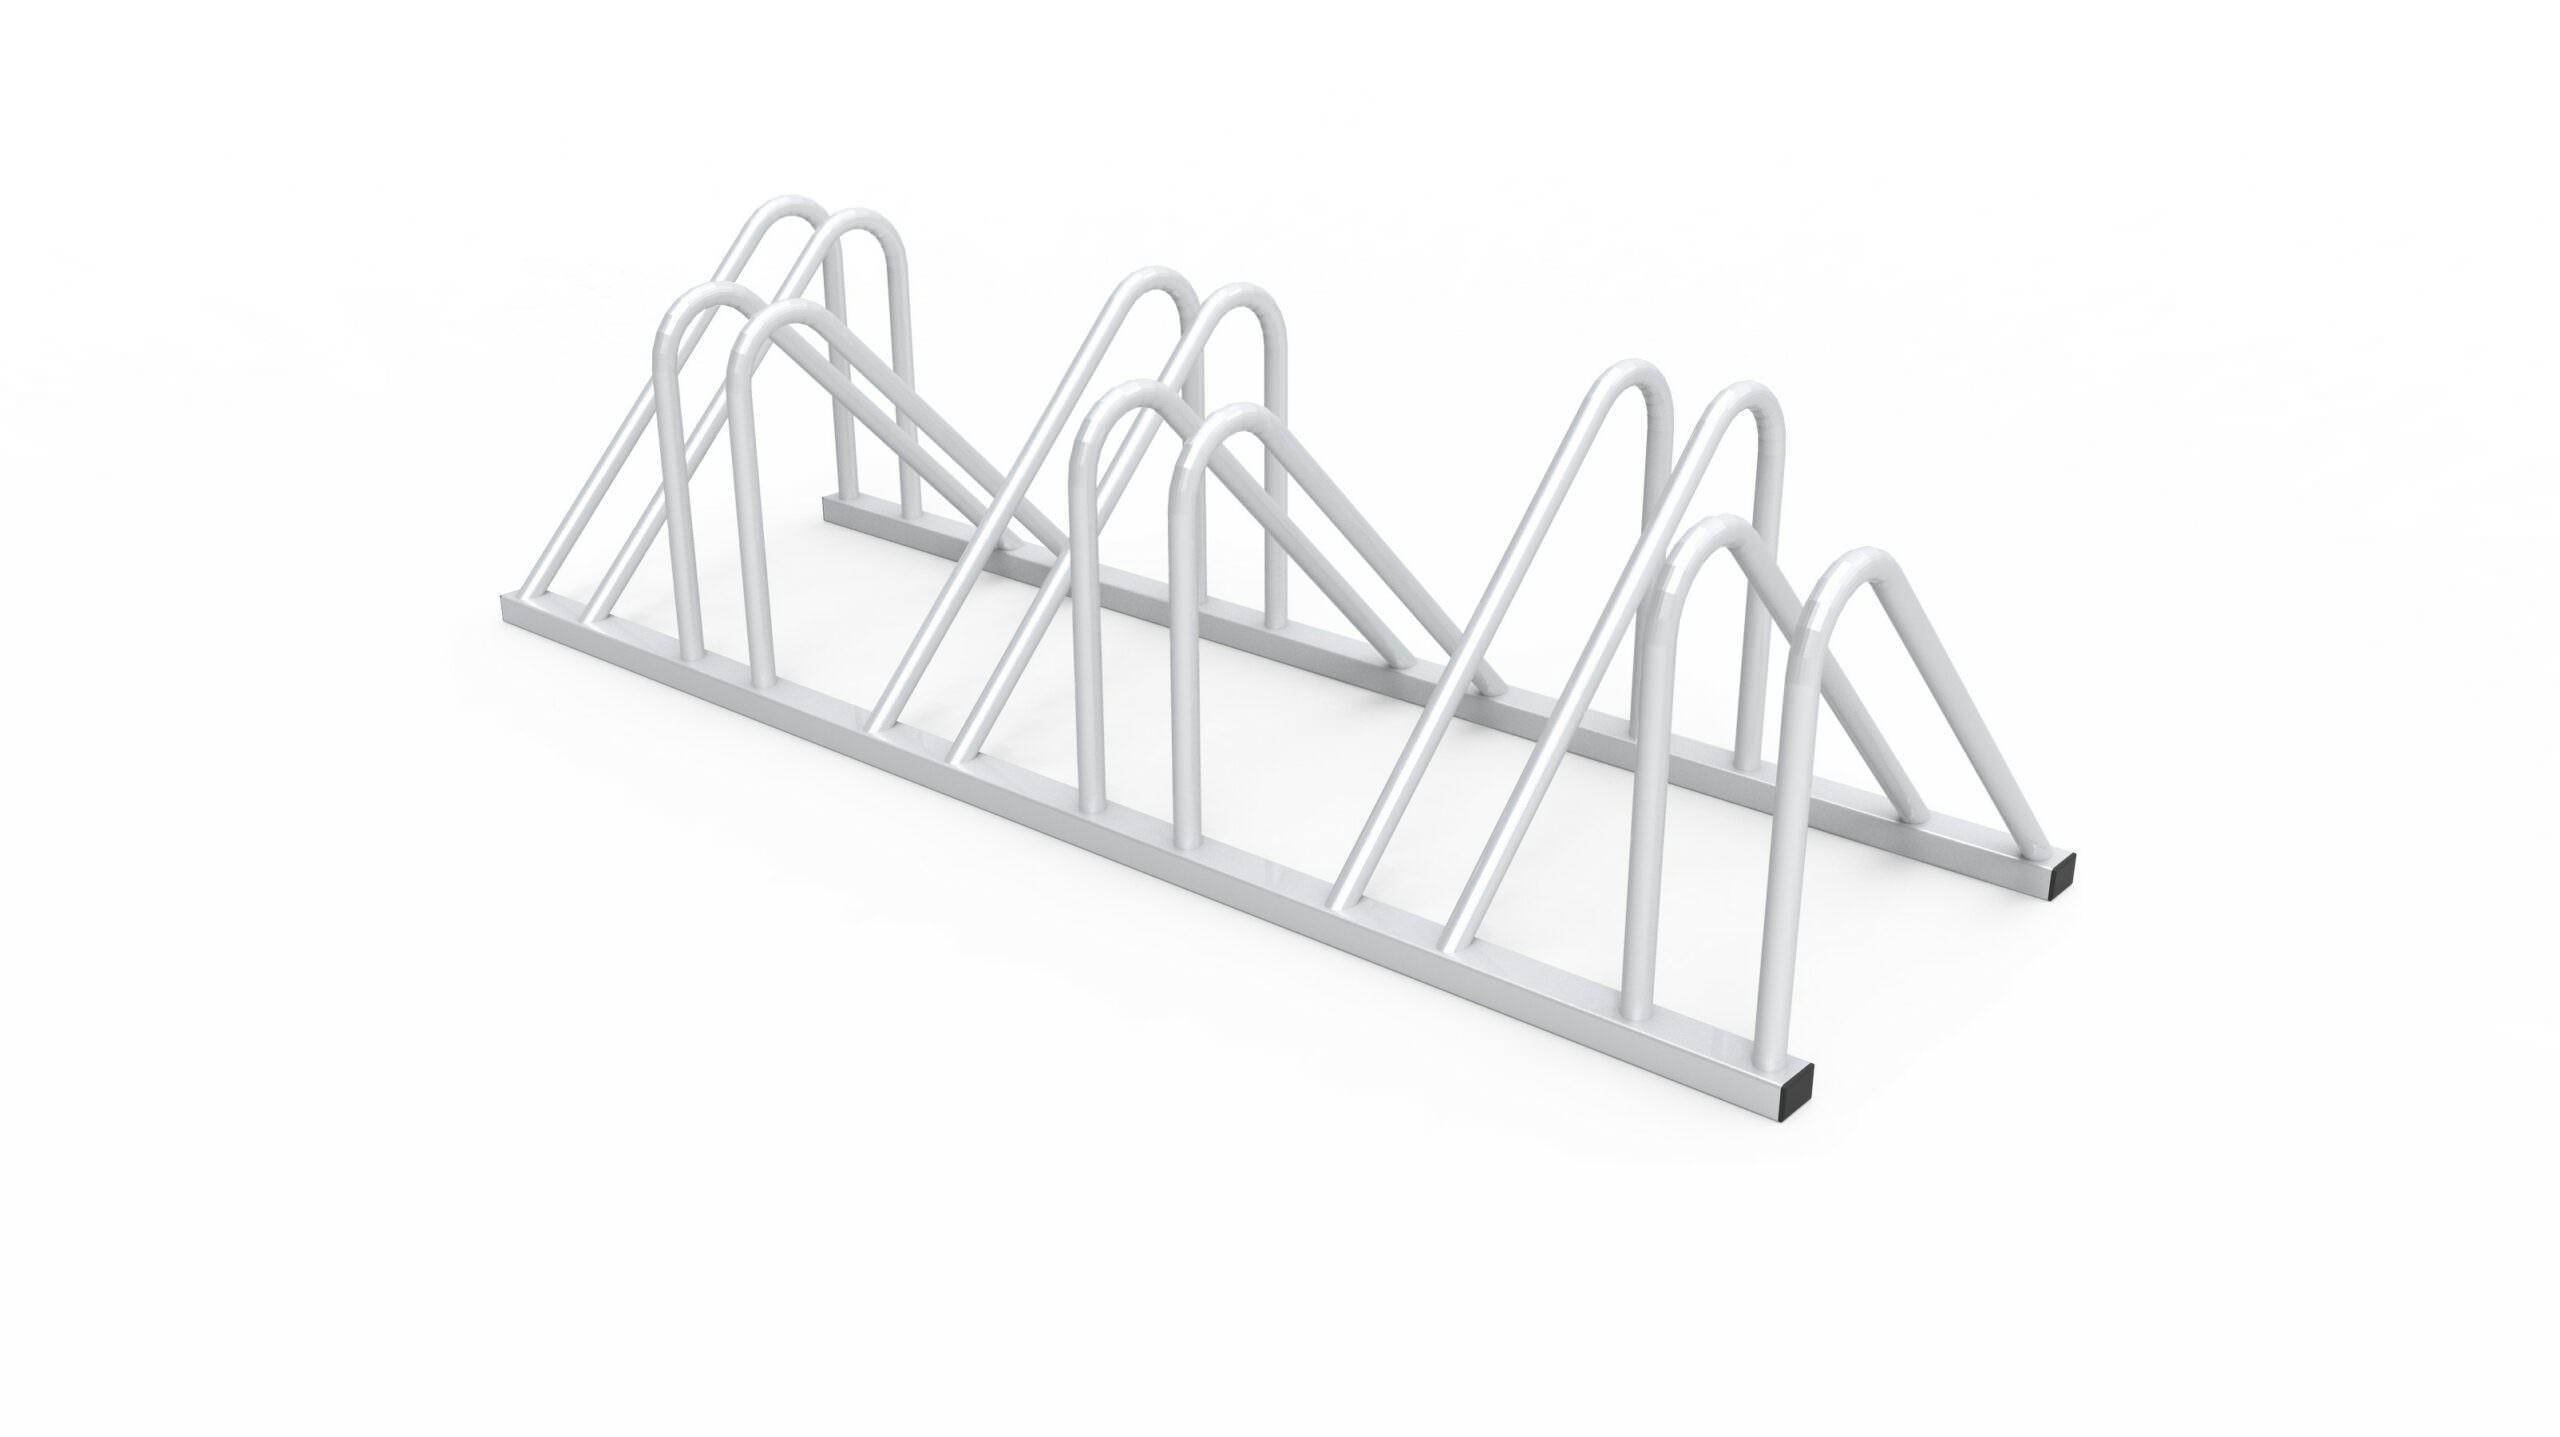 Bike Rack 3+3 Stands